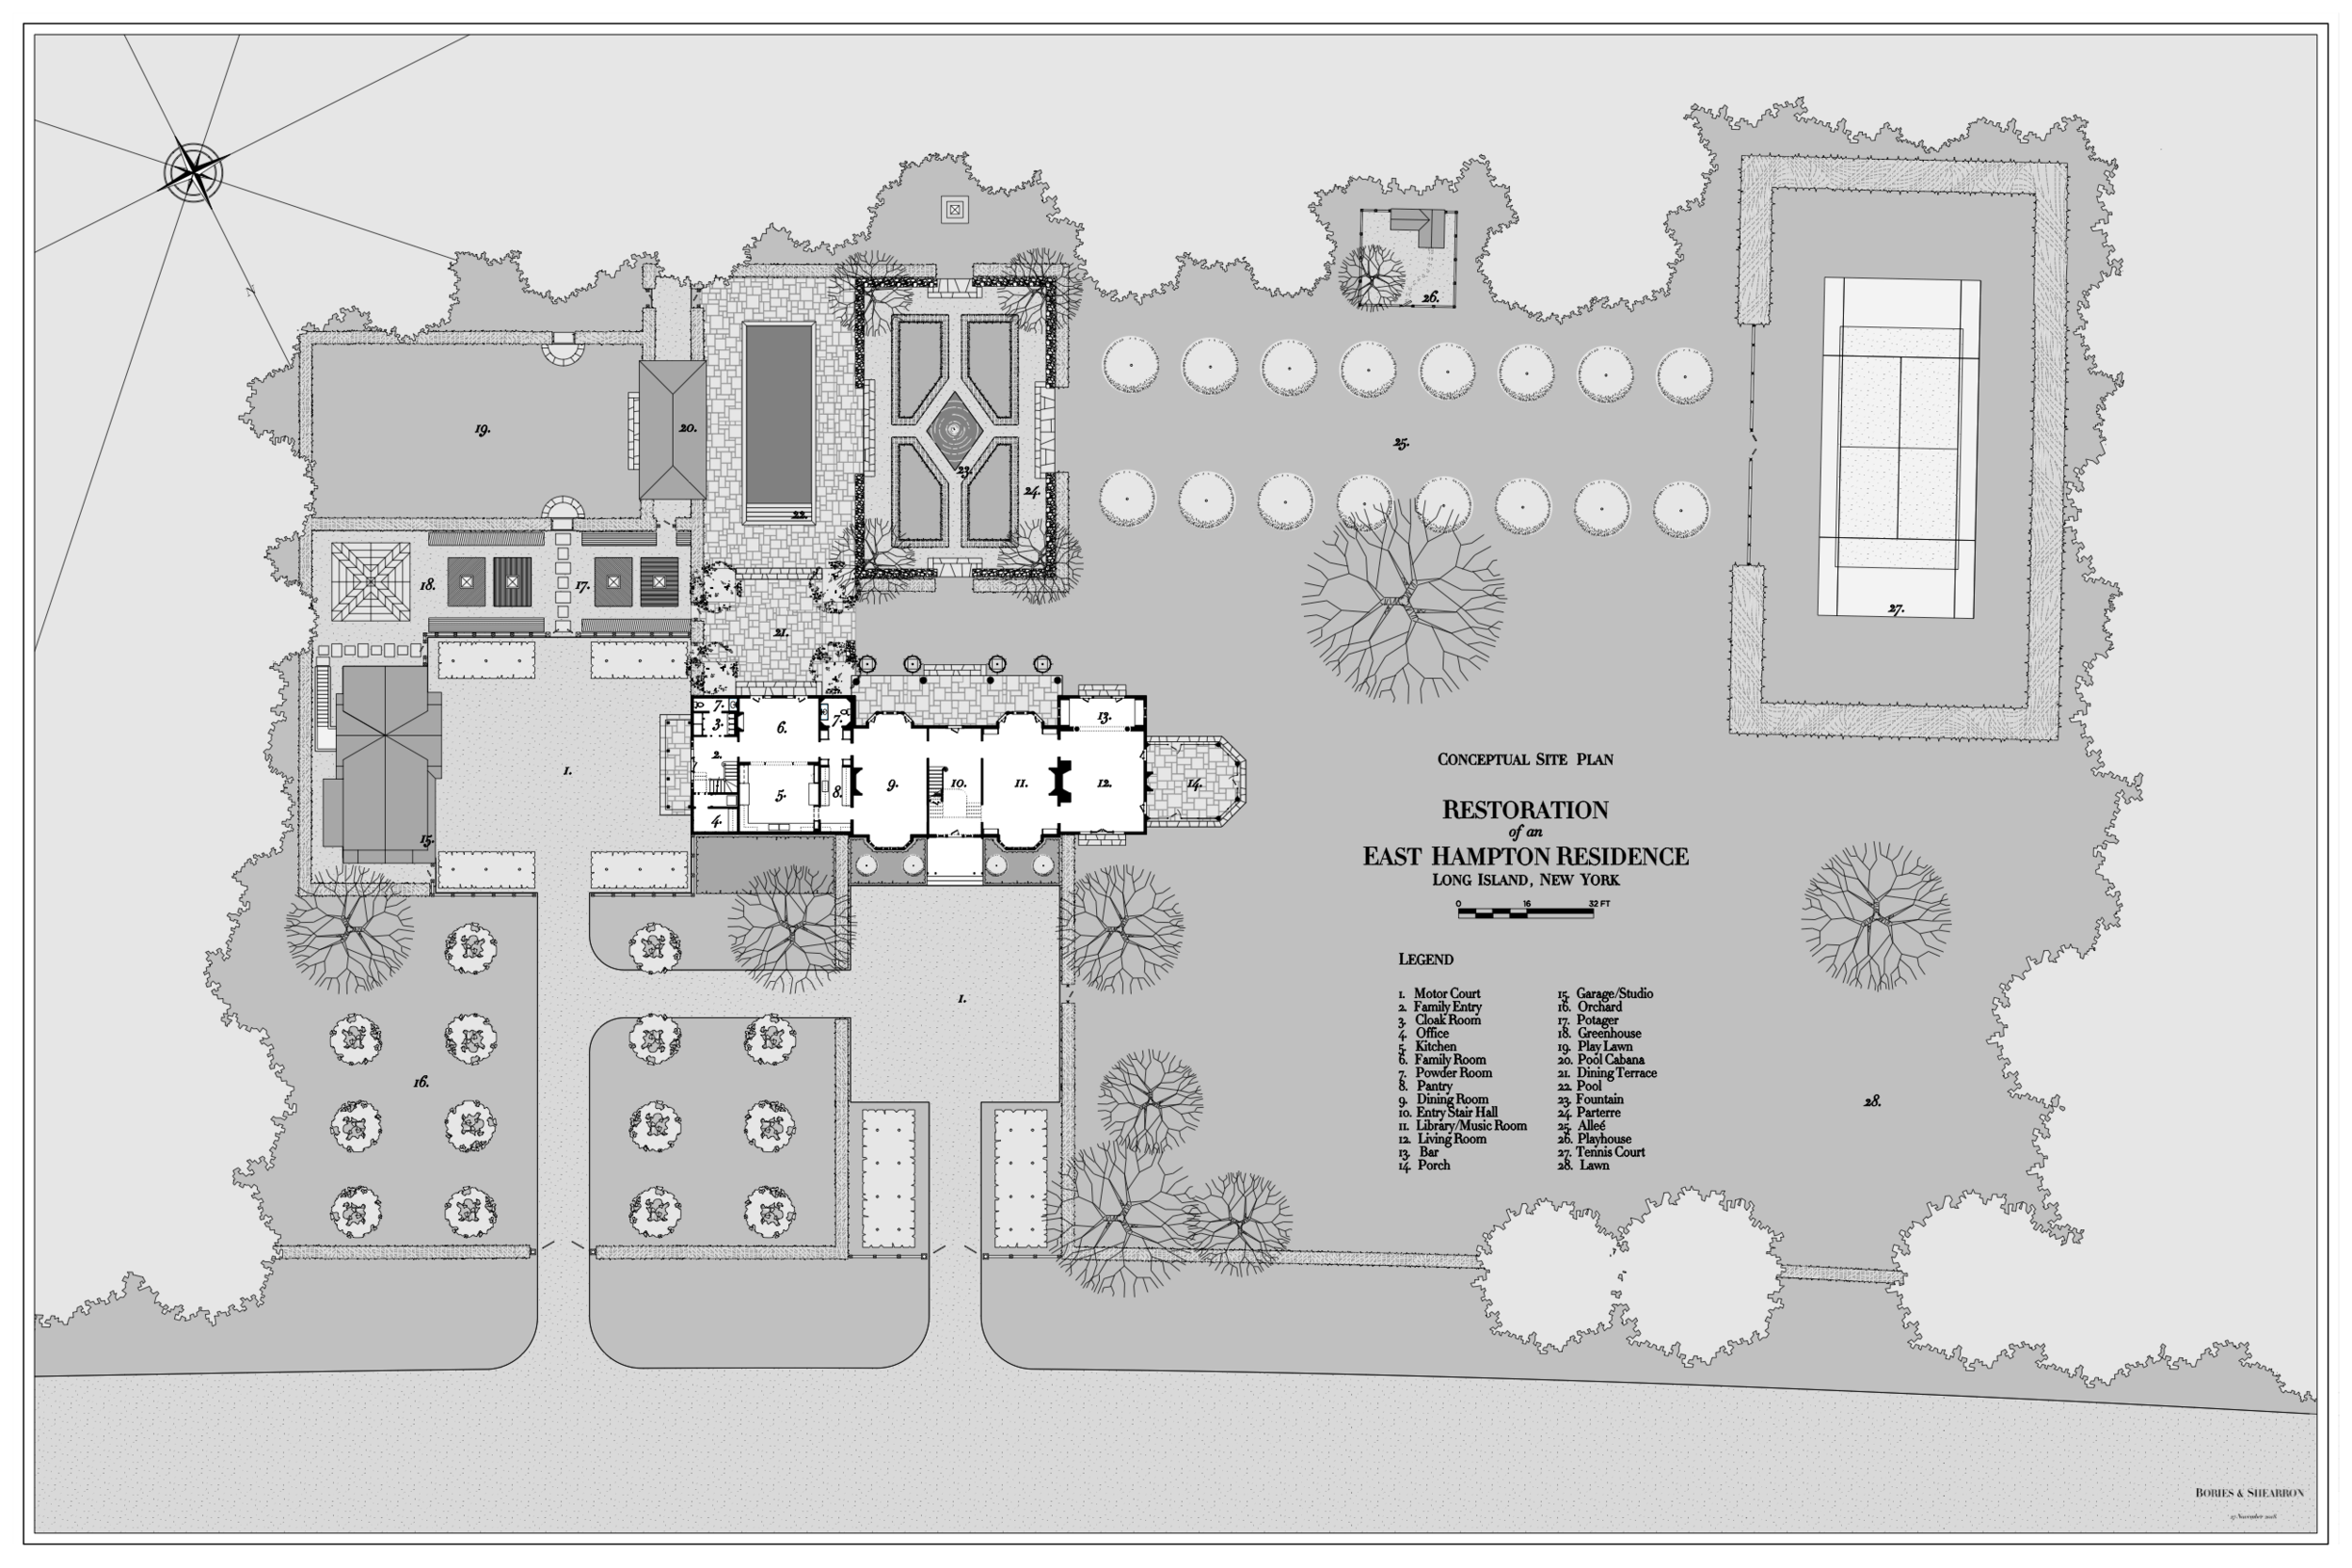 Site Plan 2x3 20181128.png